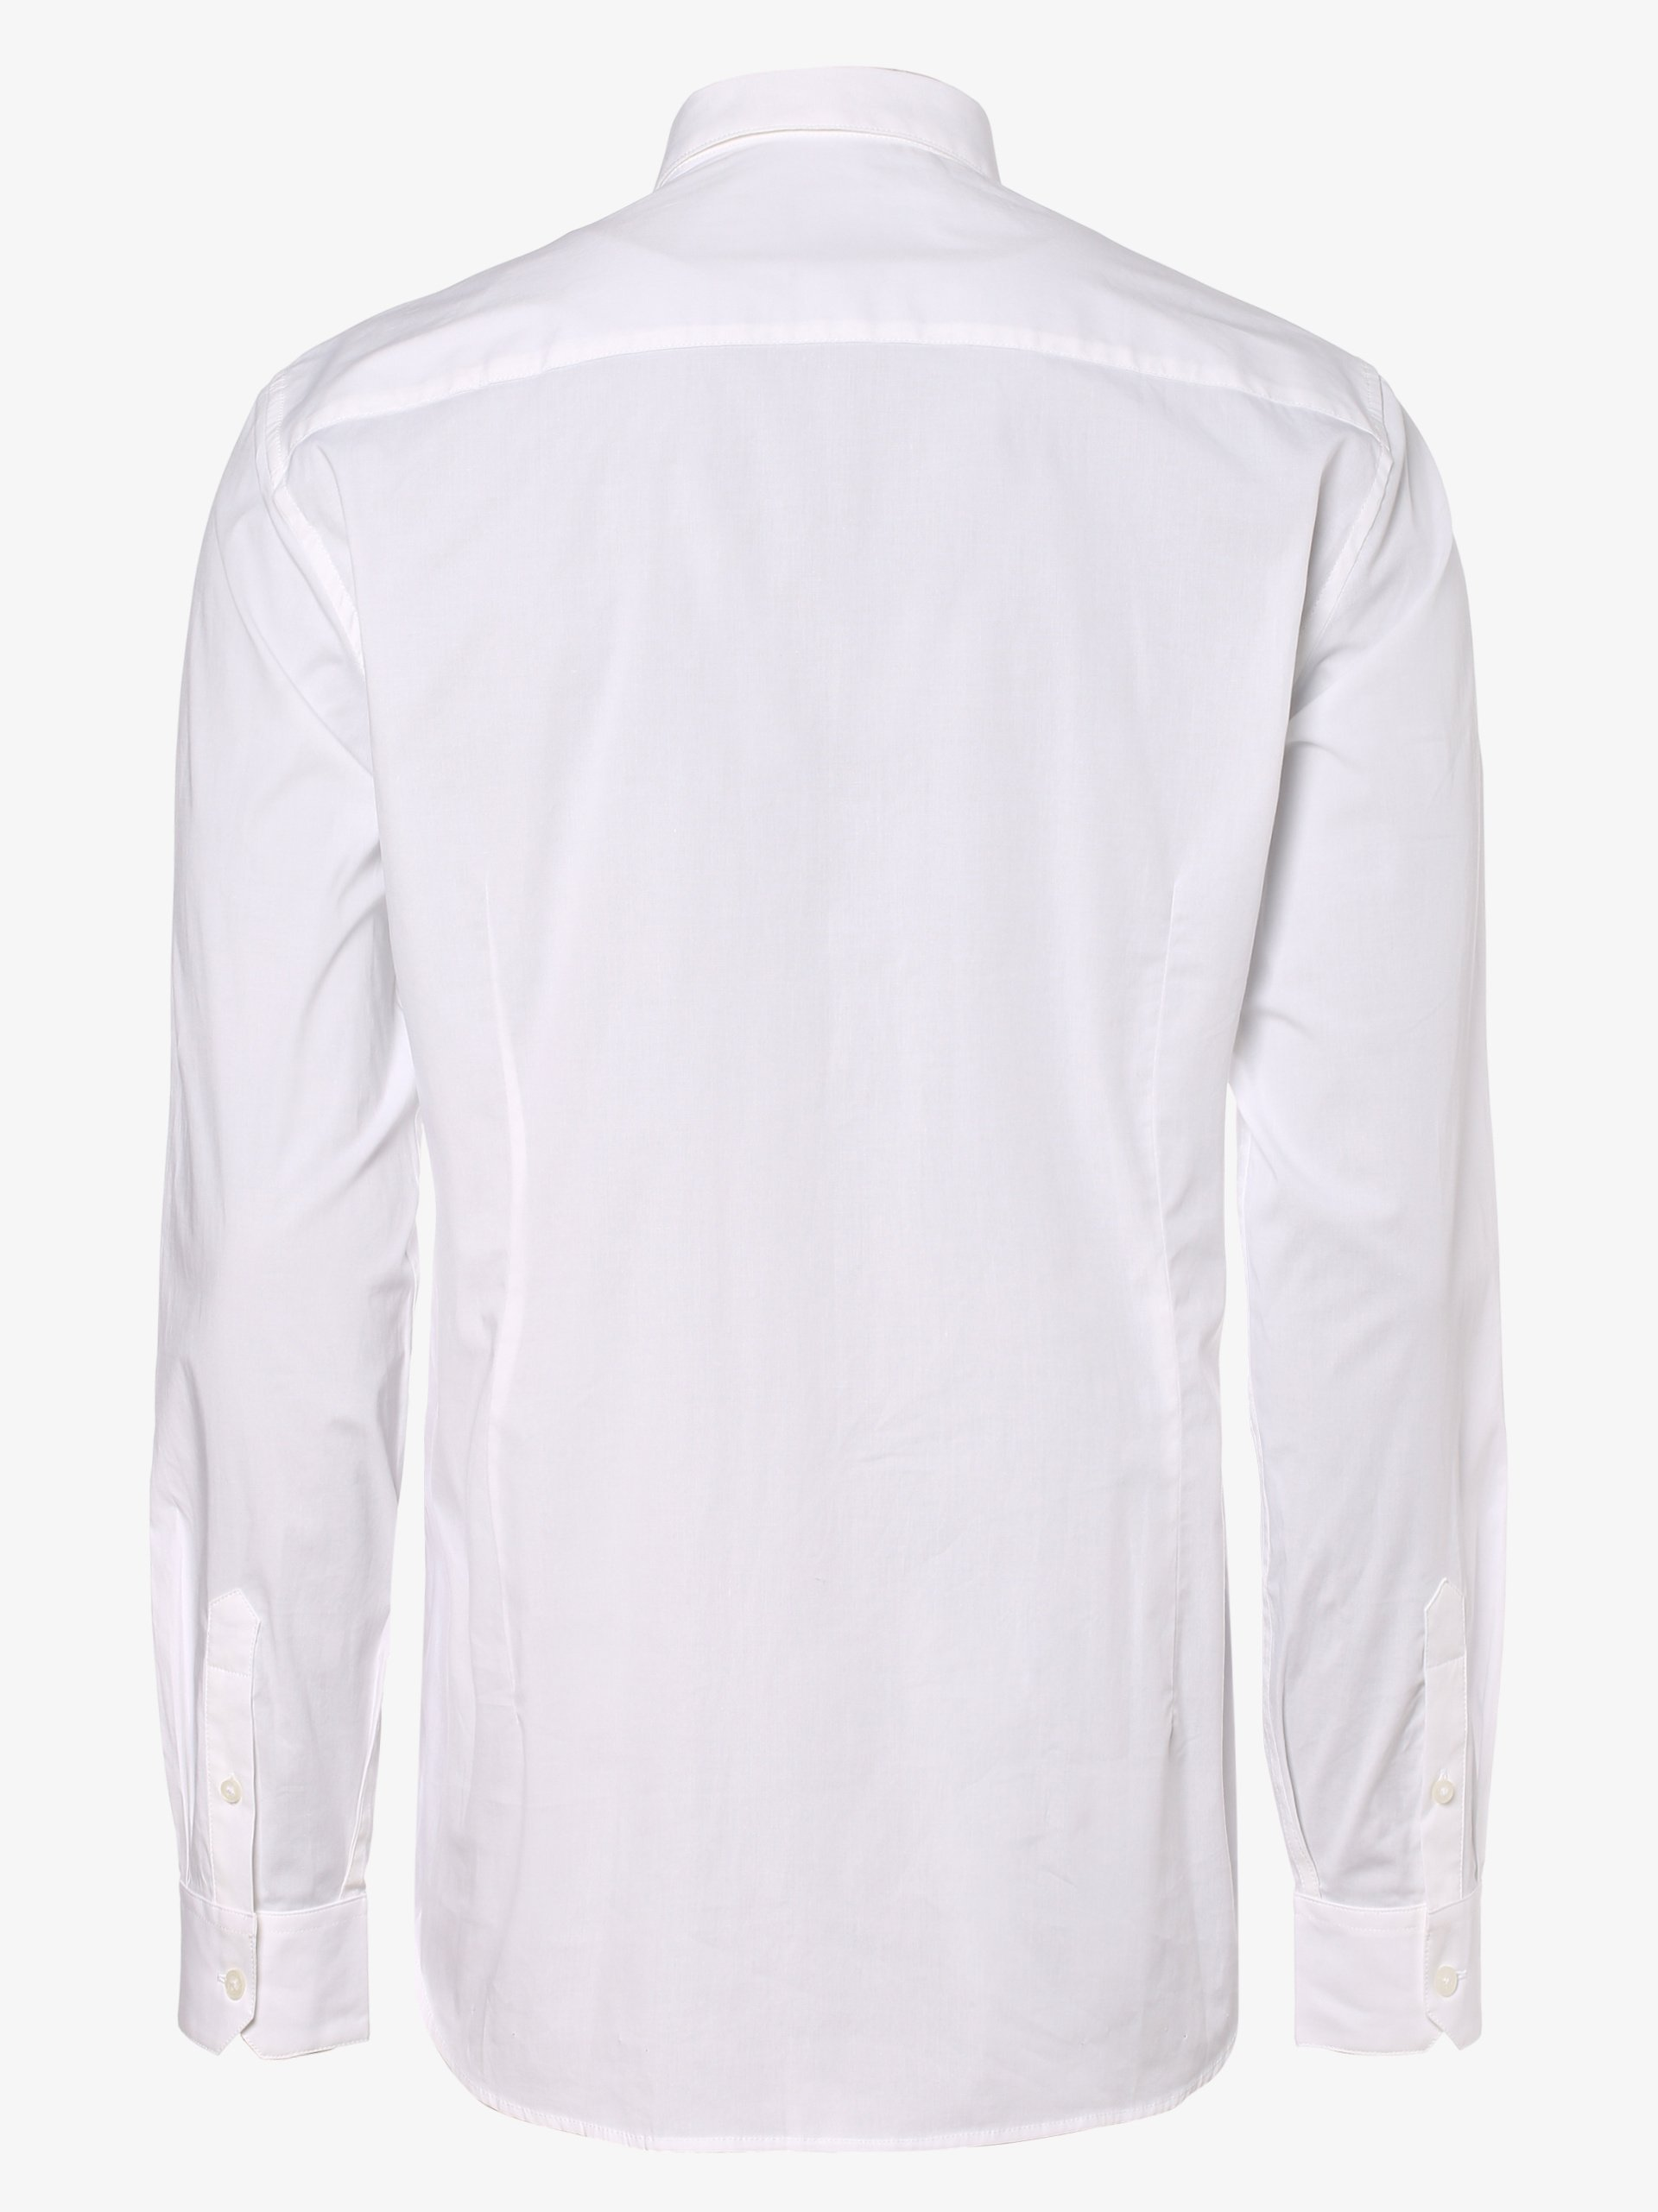 Armani Exchange Herren Hemd